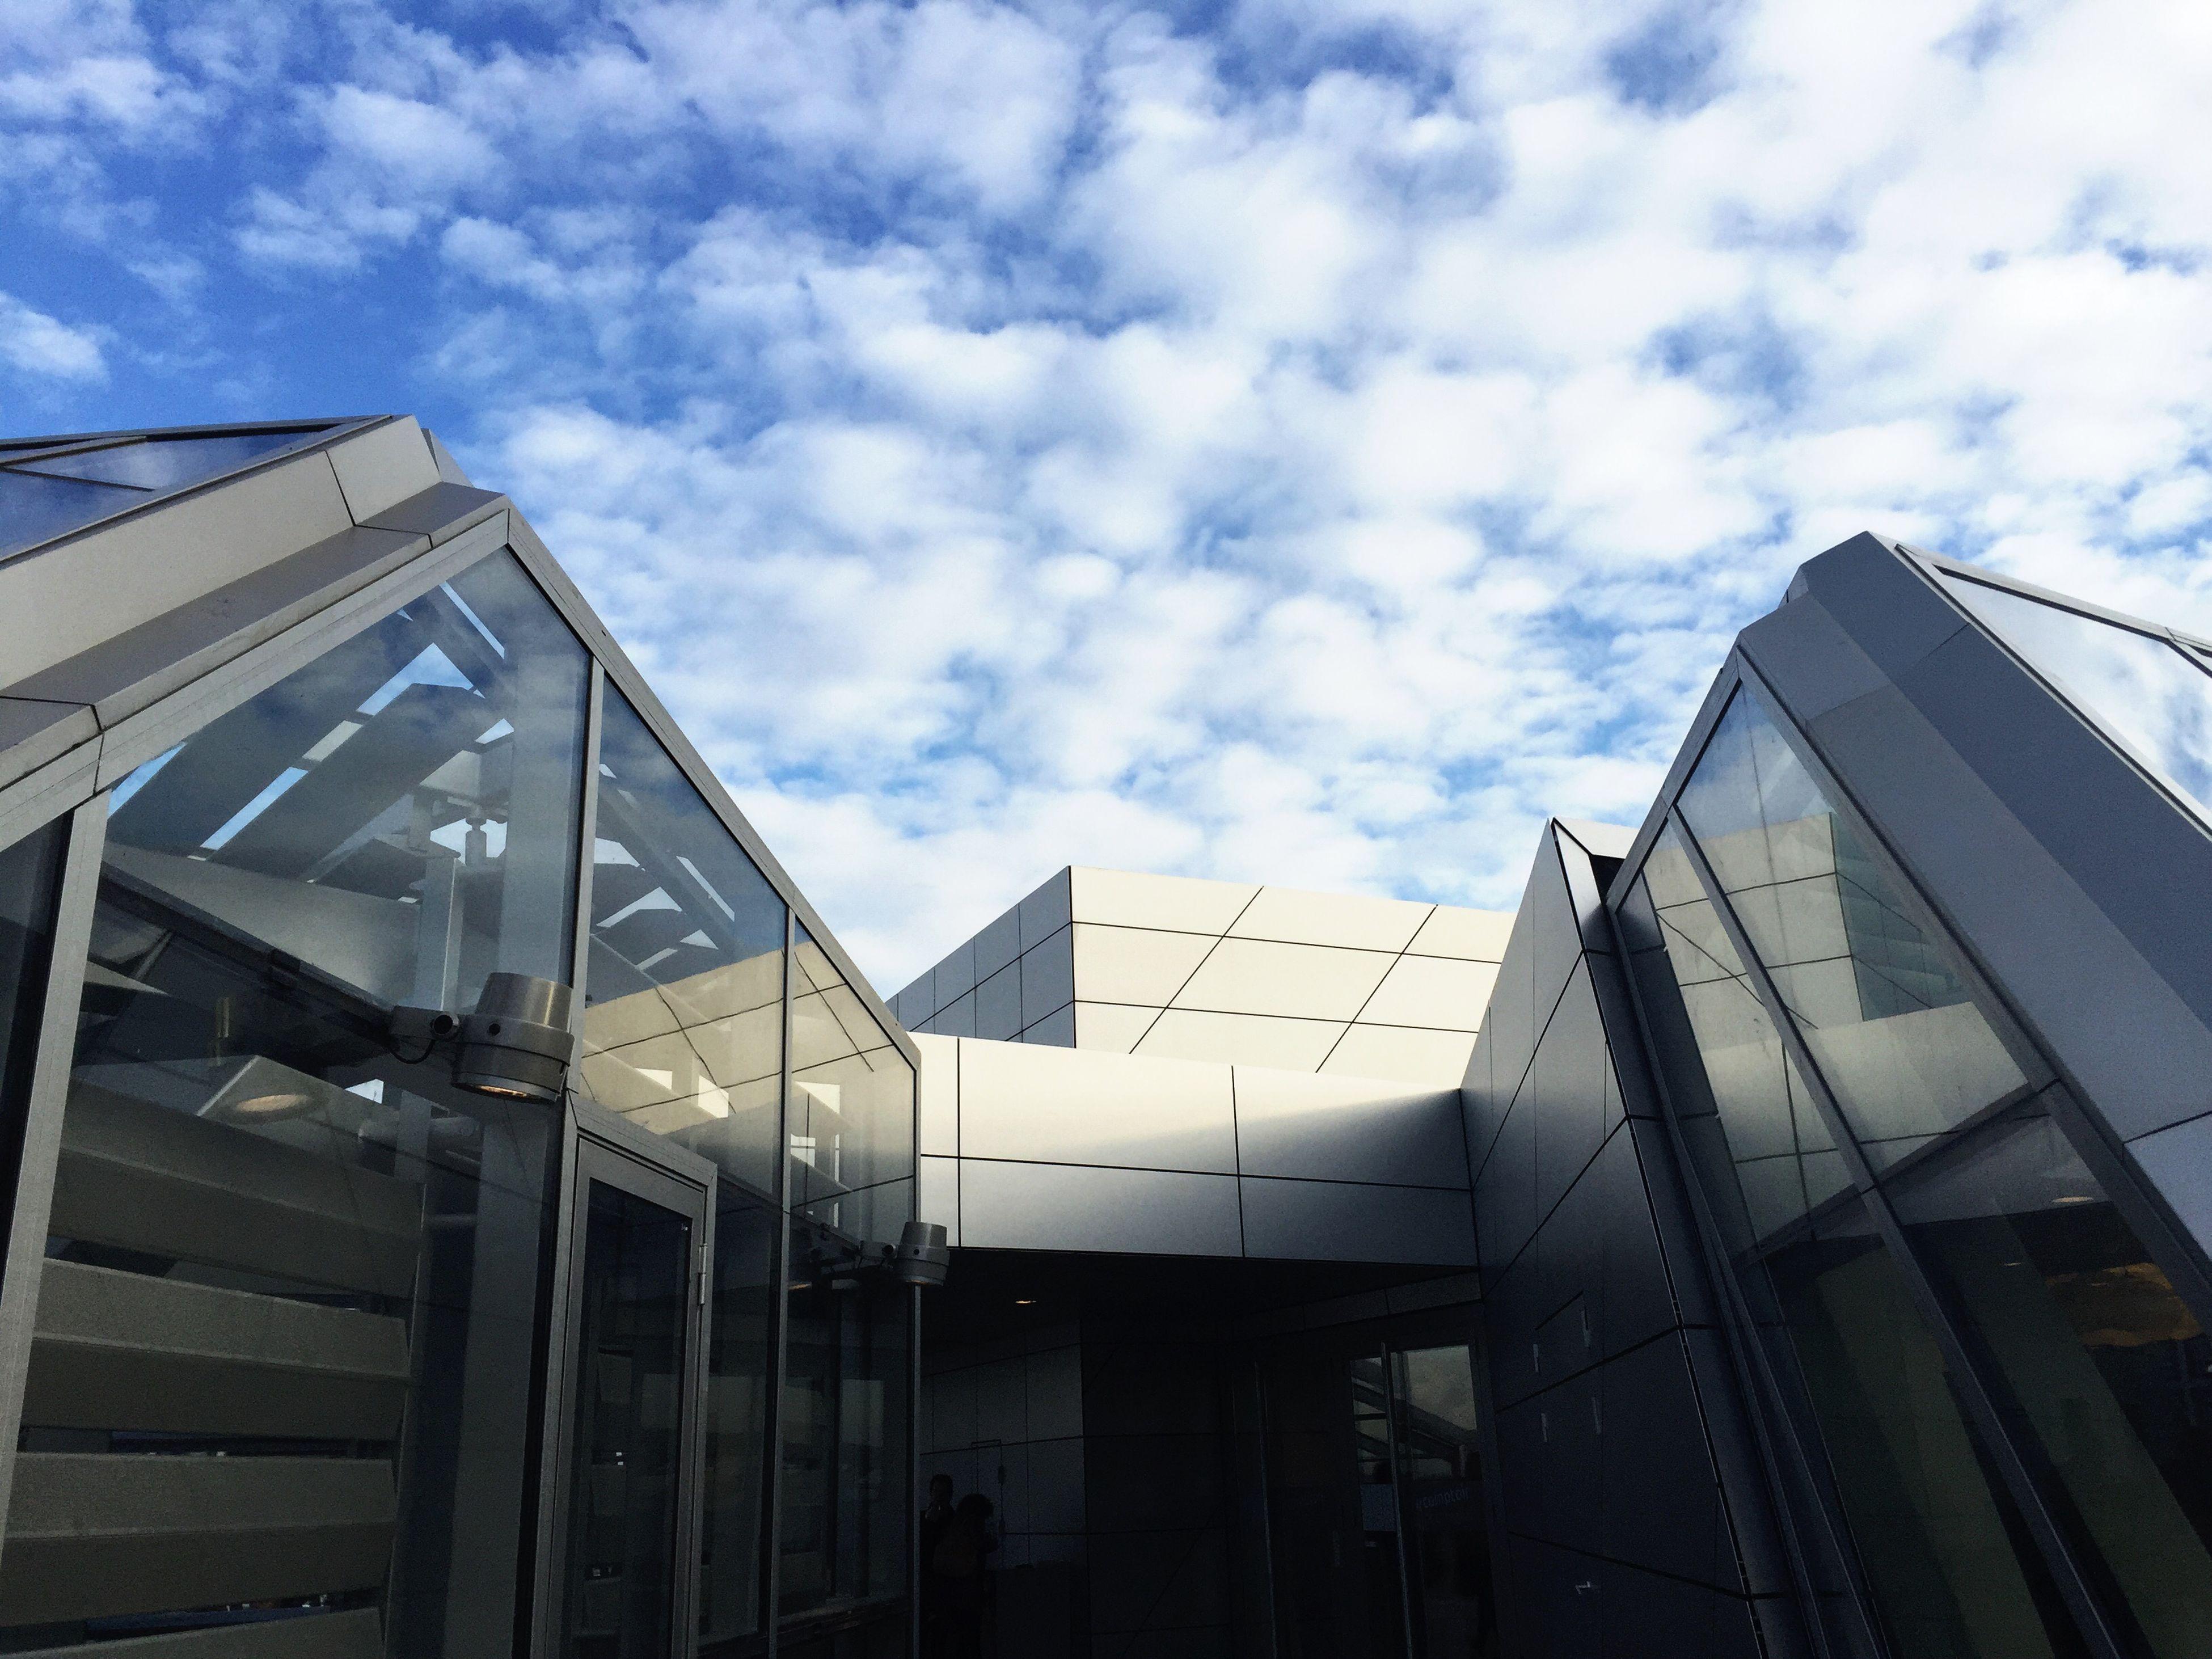 Looking Into The Future Futuristic Architecture Sky City Museum Urban Geometry